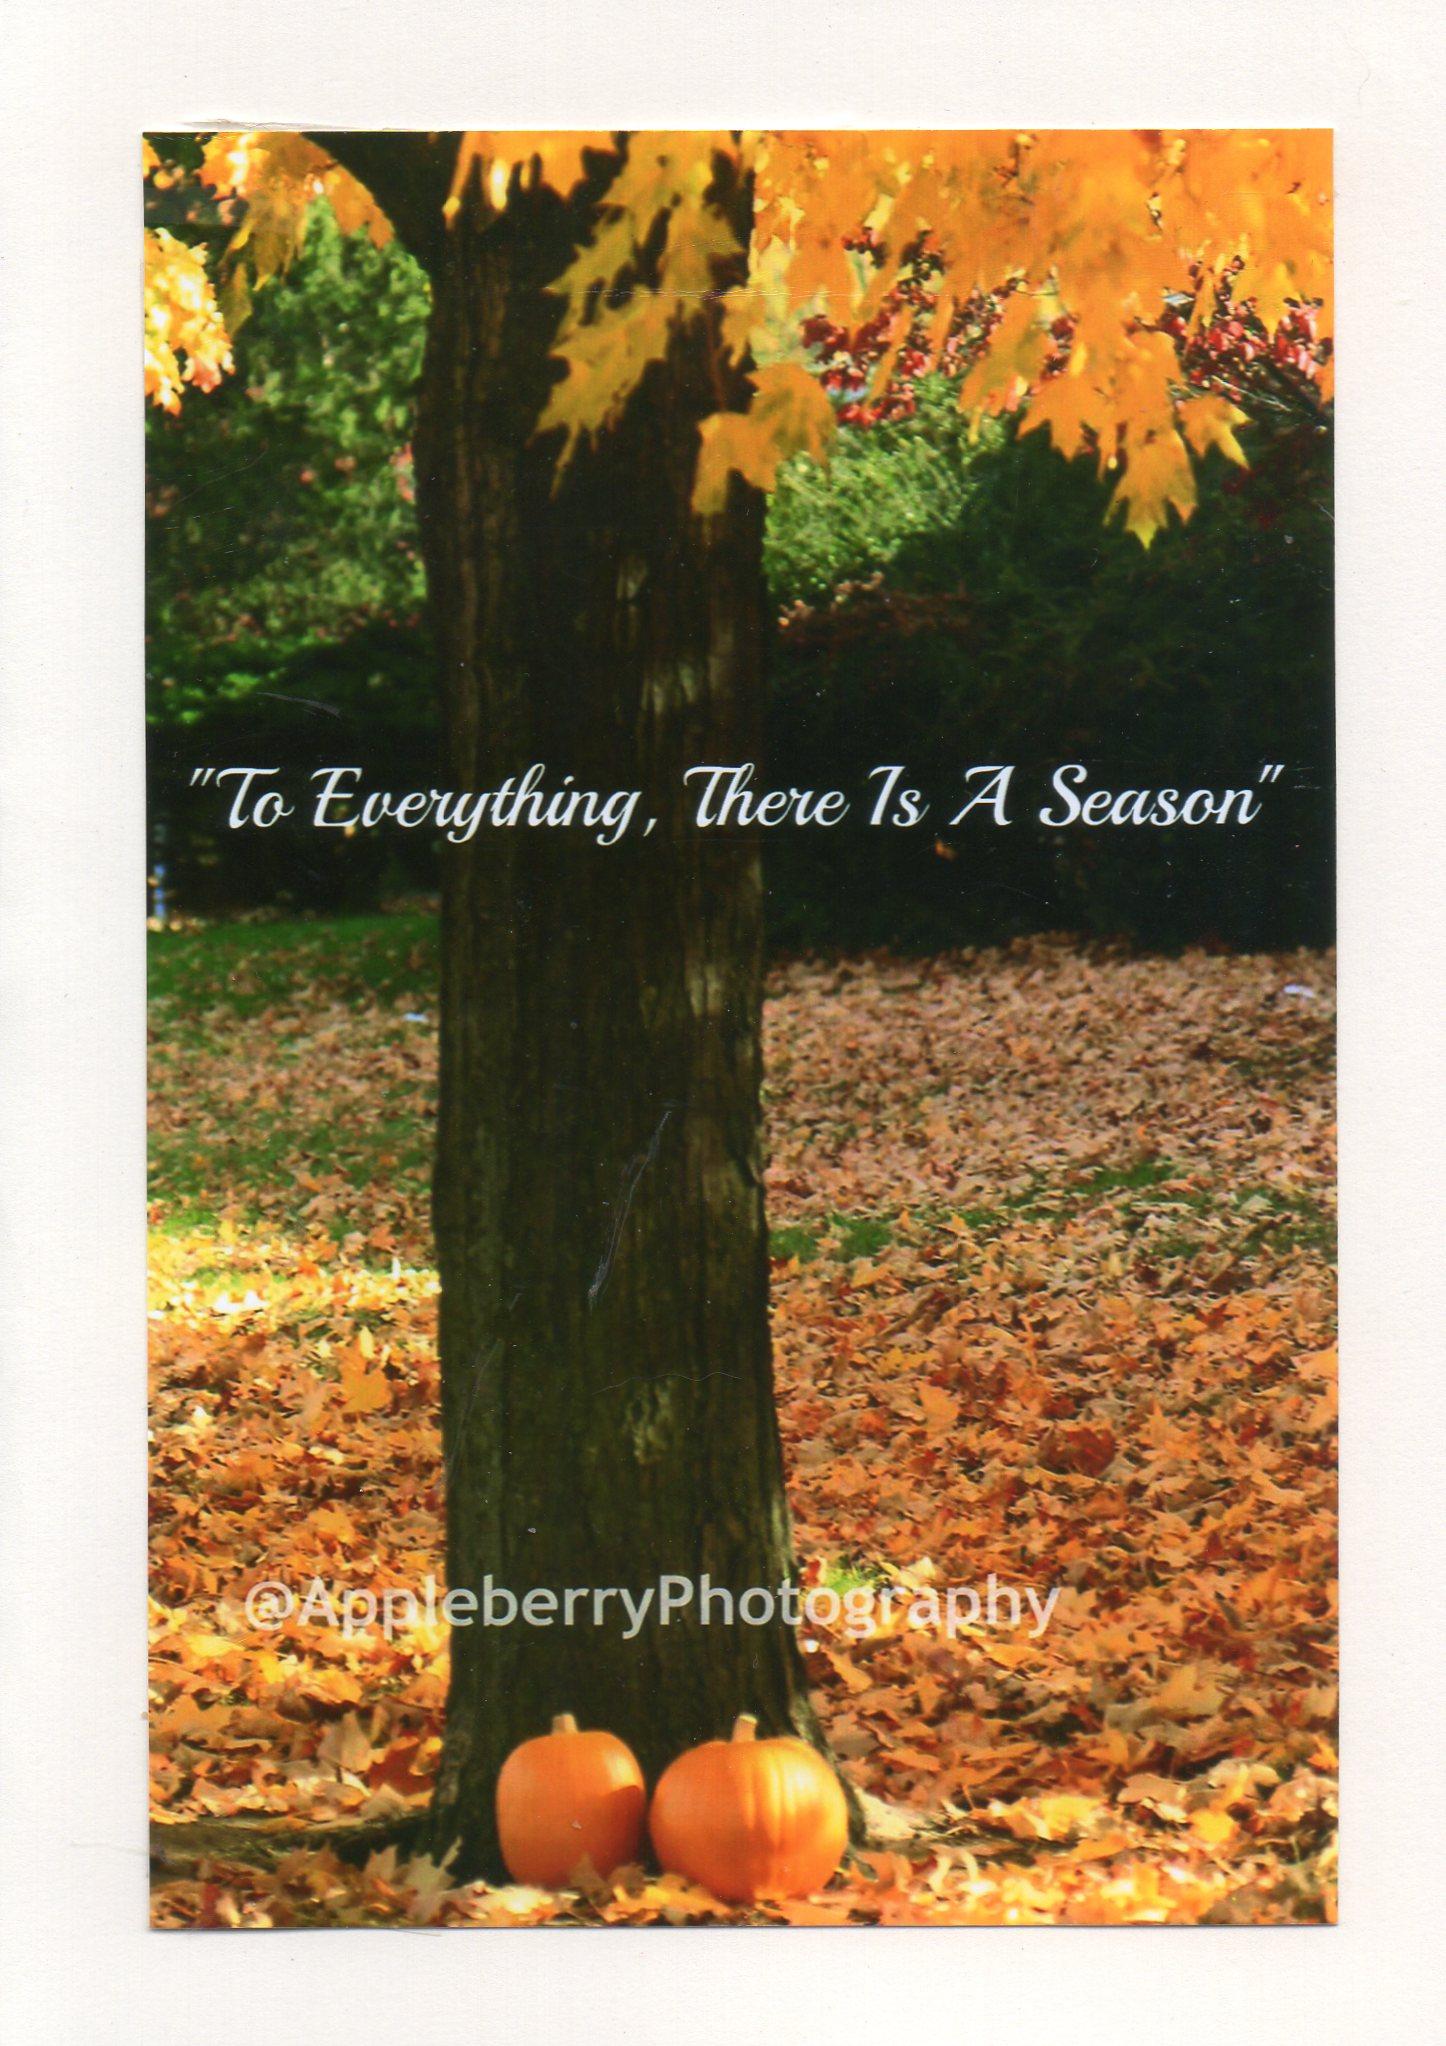 Inspirational - To Every Season